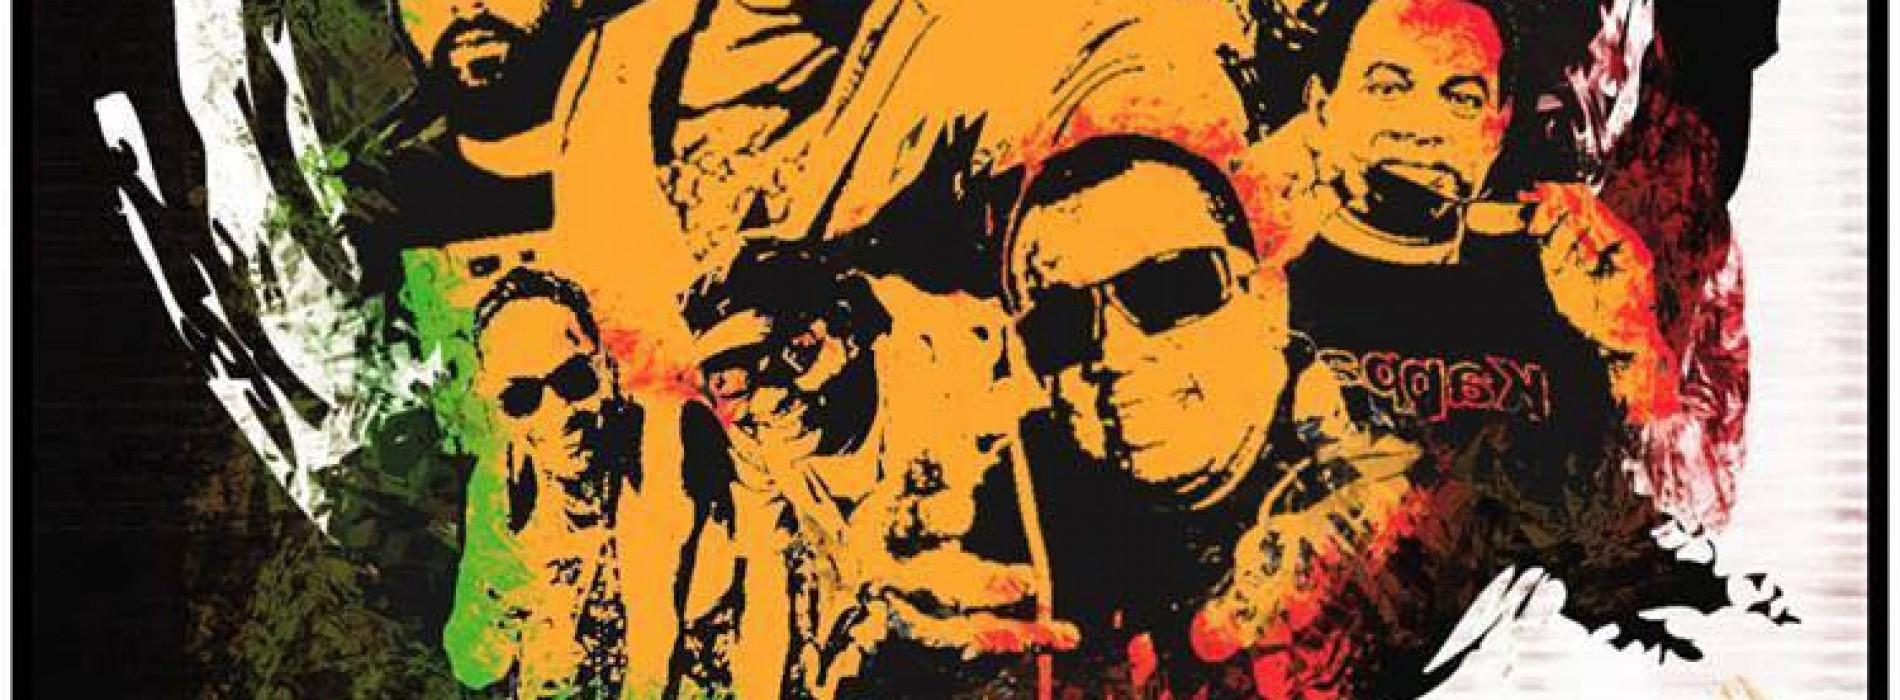 Brotherhood (religion) – Prageeth Perera & Various Artists